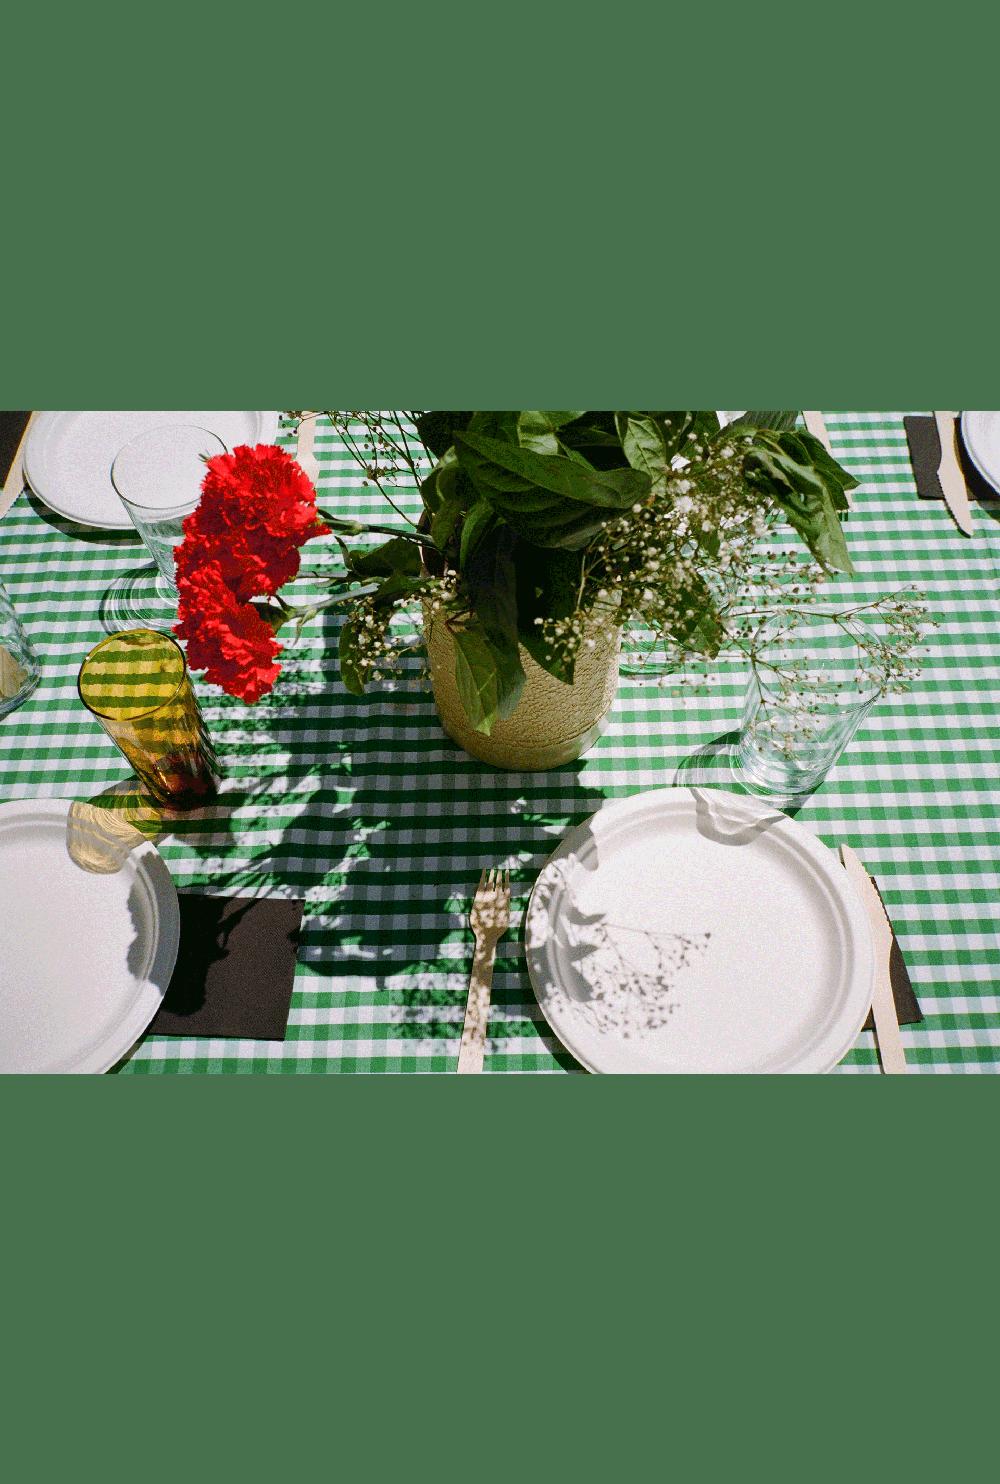 tiberi-club-ephemeral-dining-club-12-ok